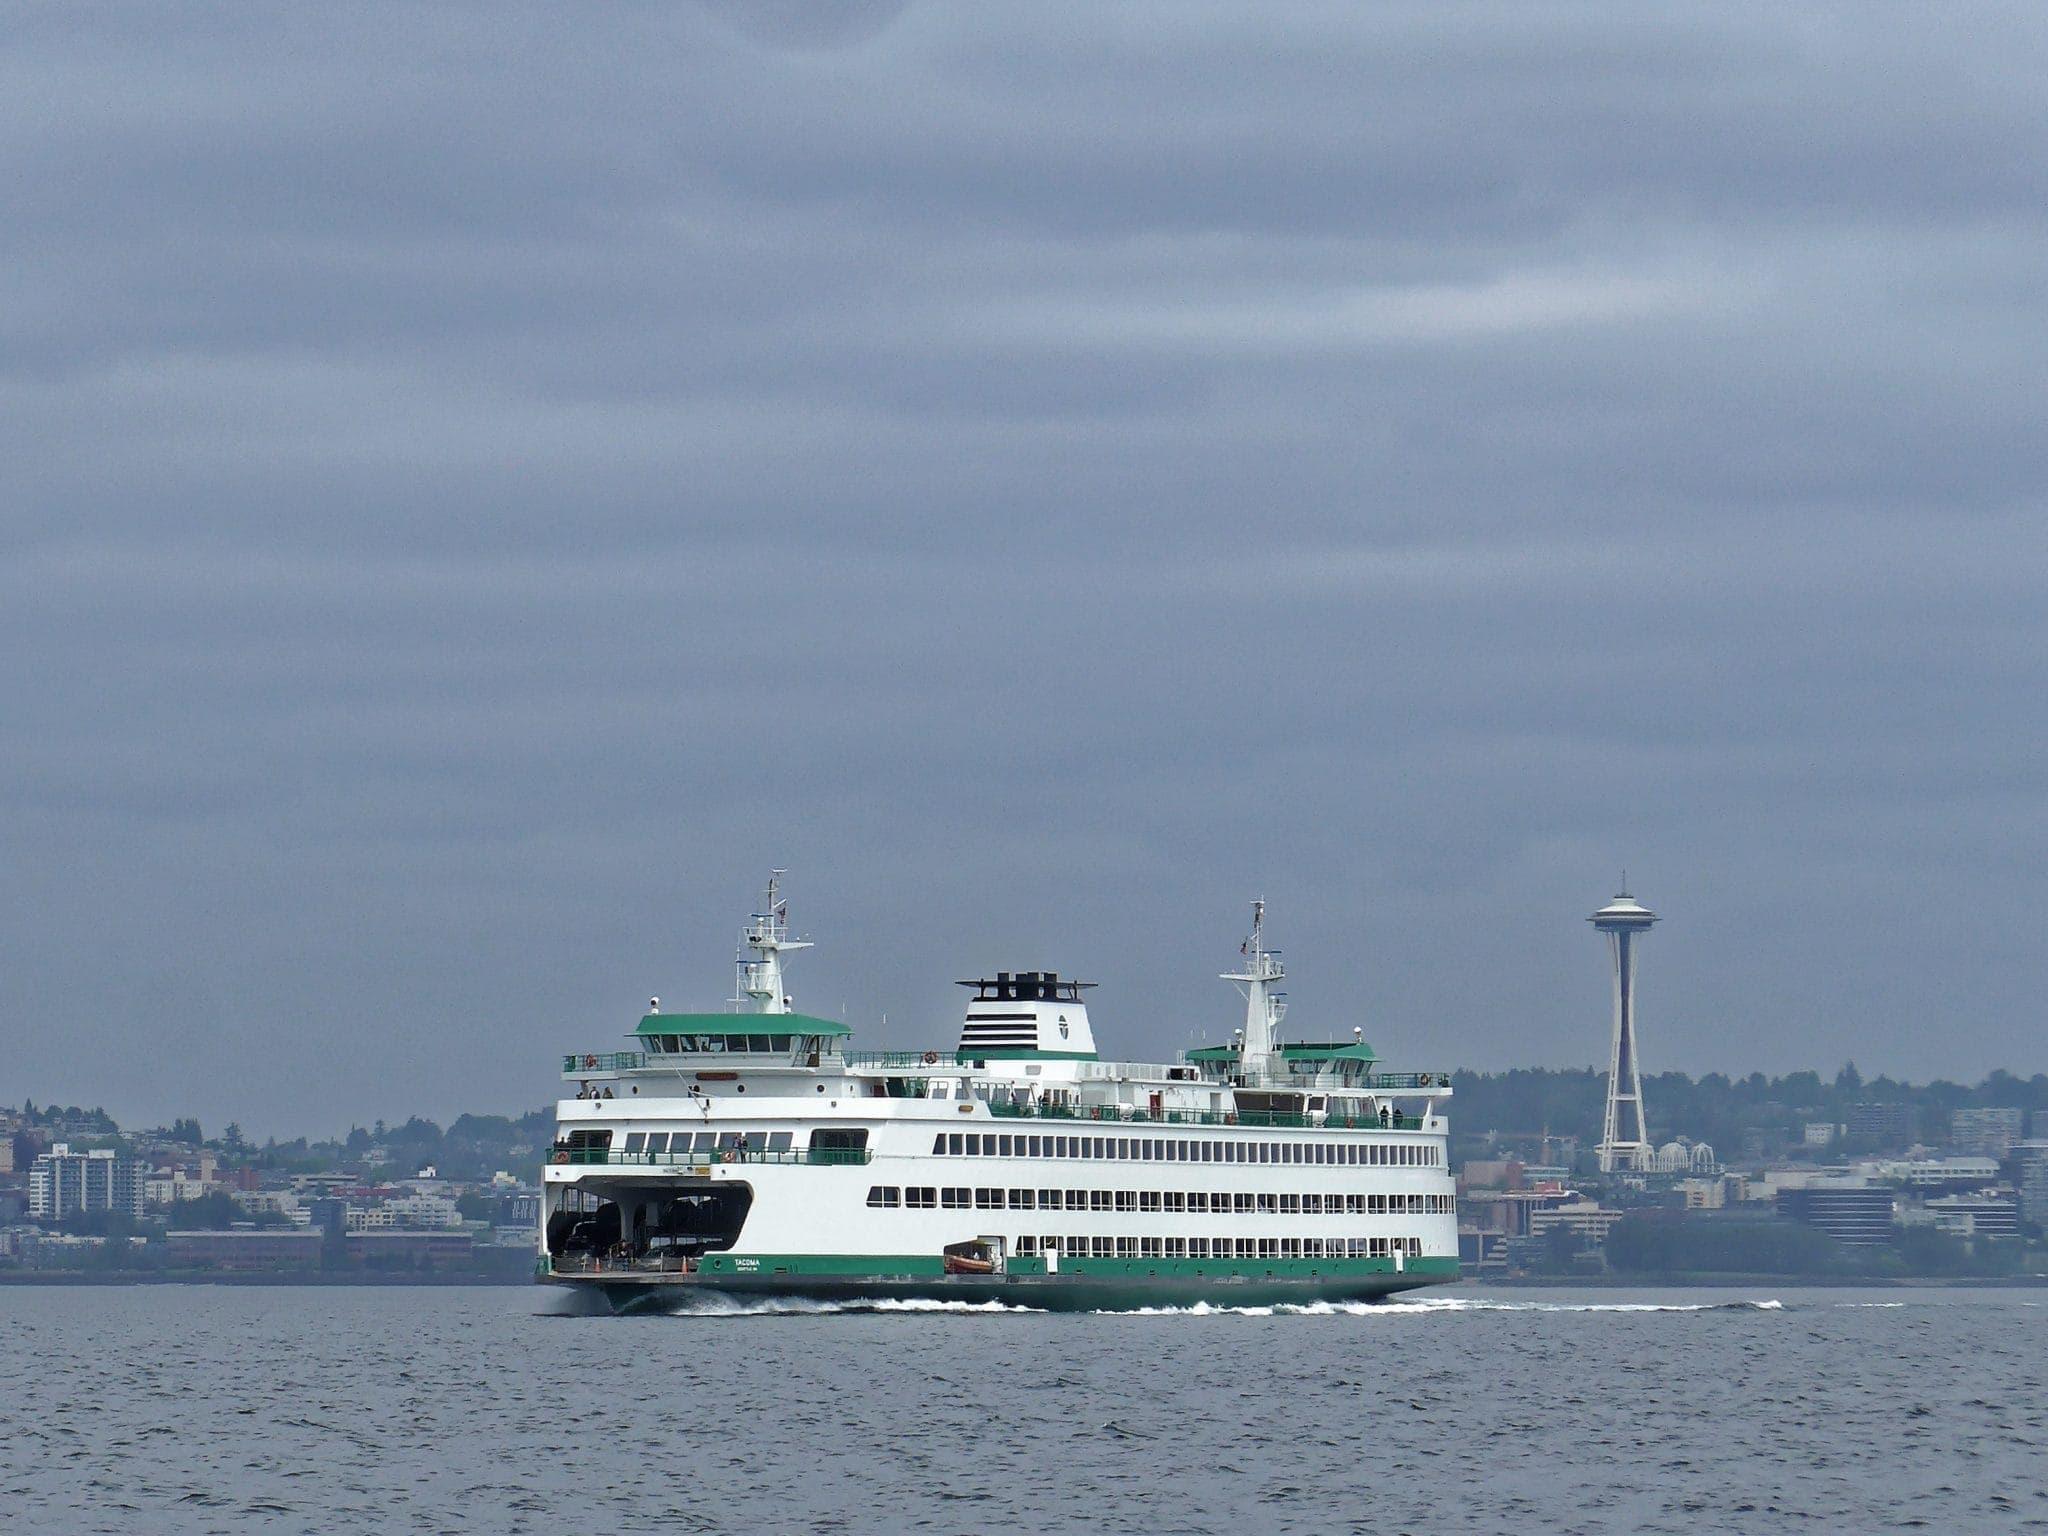 WSF Tacoma headed towards Bainbridge Island